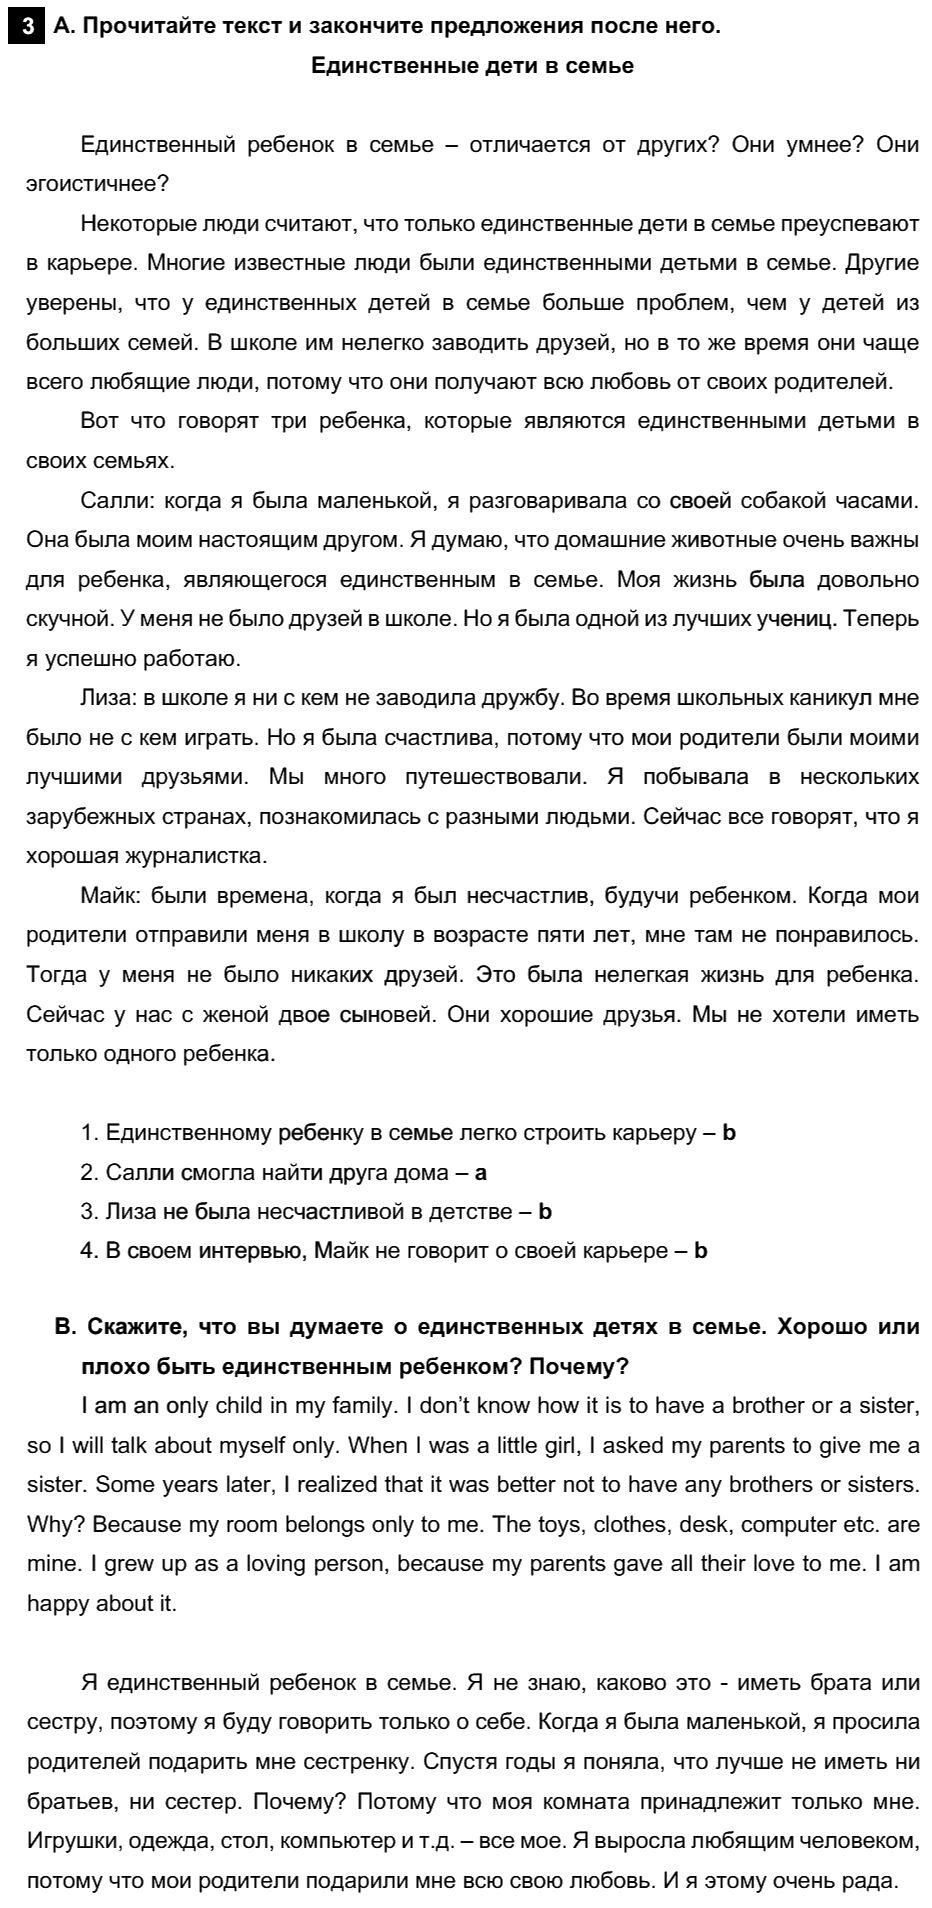 Английский язык 7 класс Афанасьева О. В. Unit 1. Школа и учёба / Шаг 8: 3